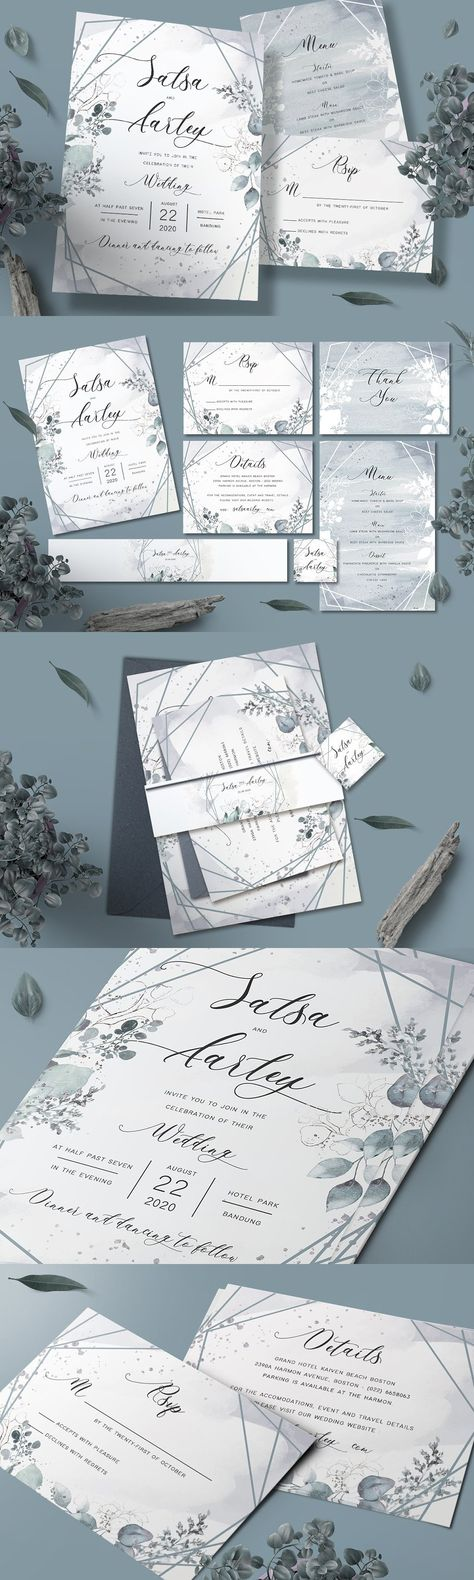 Foliage Wedding Invitation